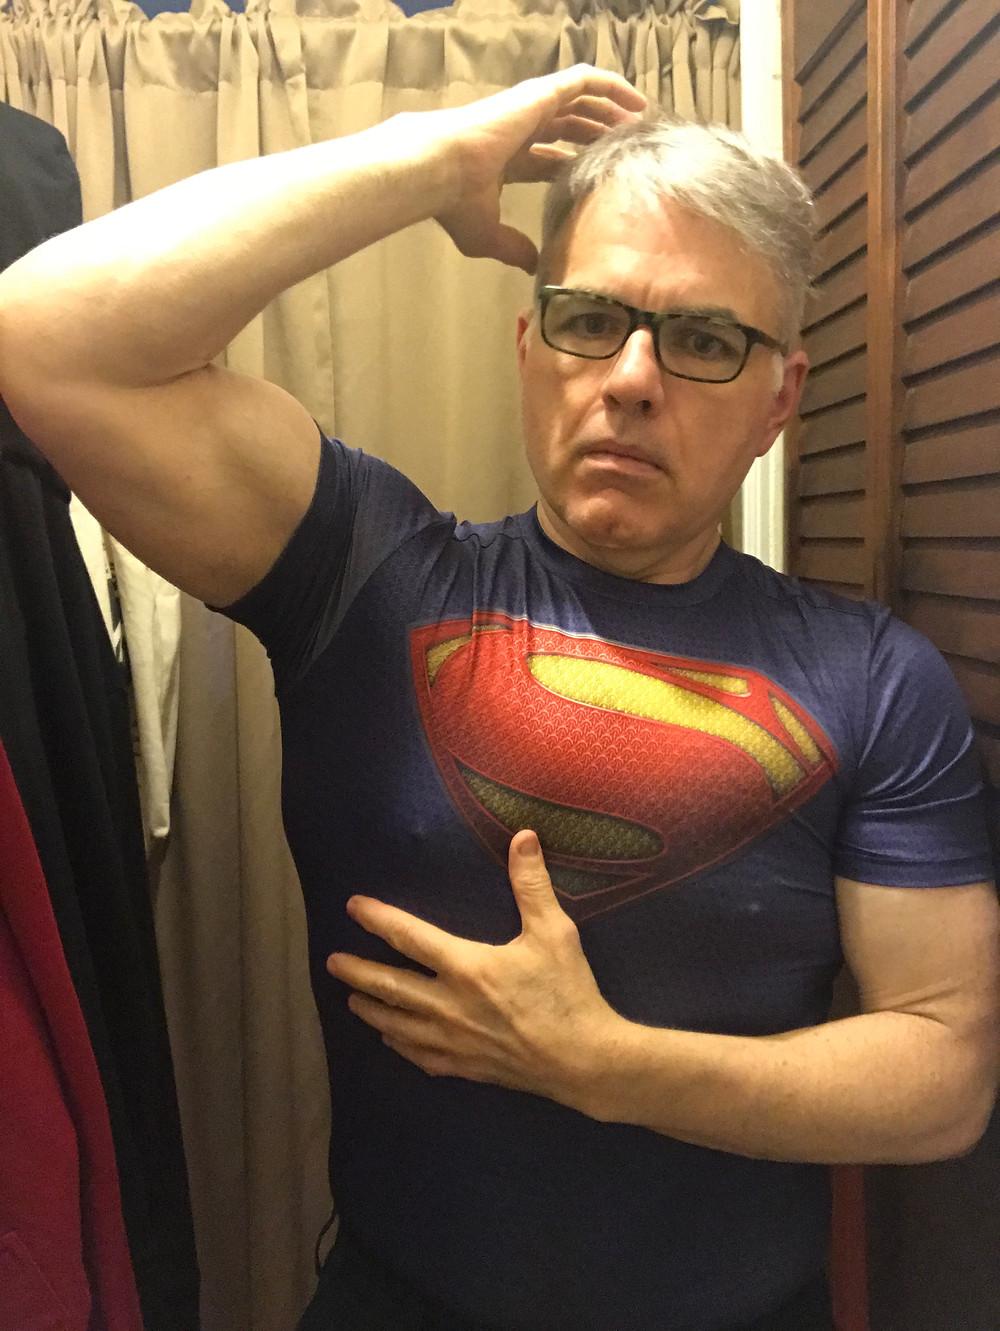 a little bit Clark, a little bit Kal-El :)